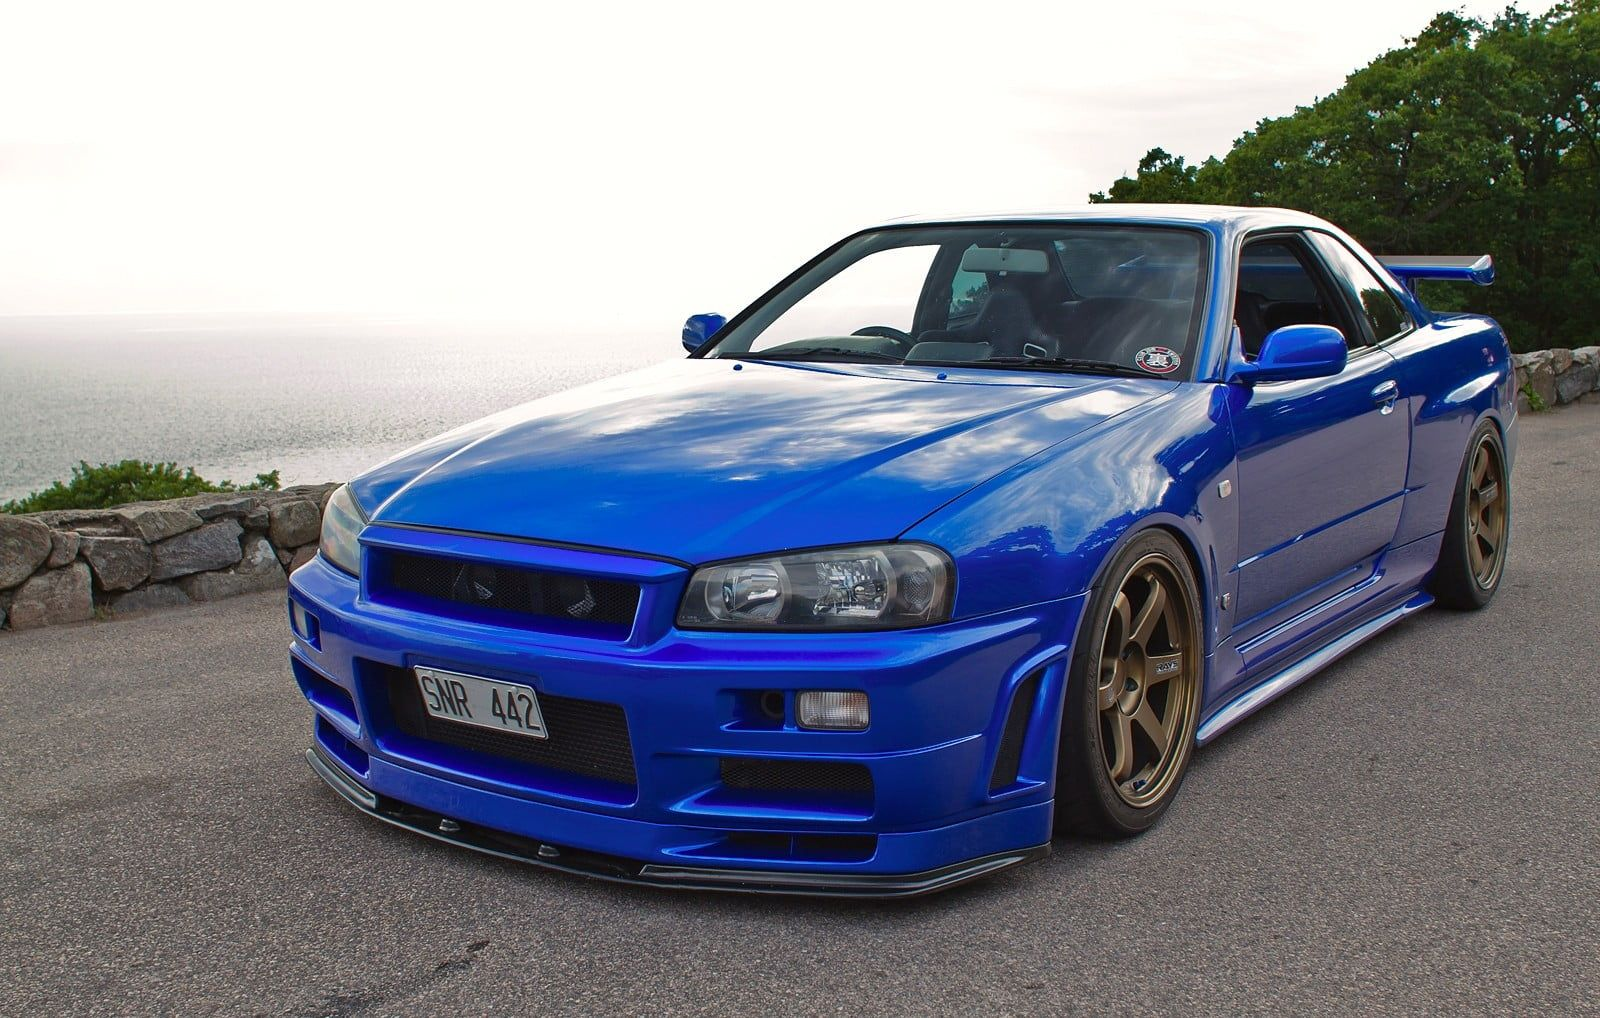 Blue Nissan Skyline R34 Wallpapers - Top Free Blue Nissan ...